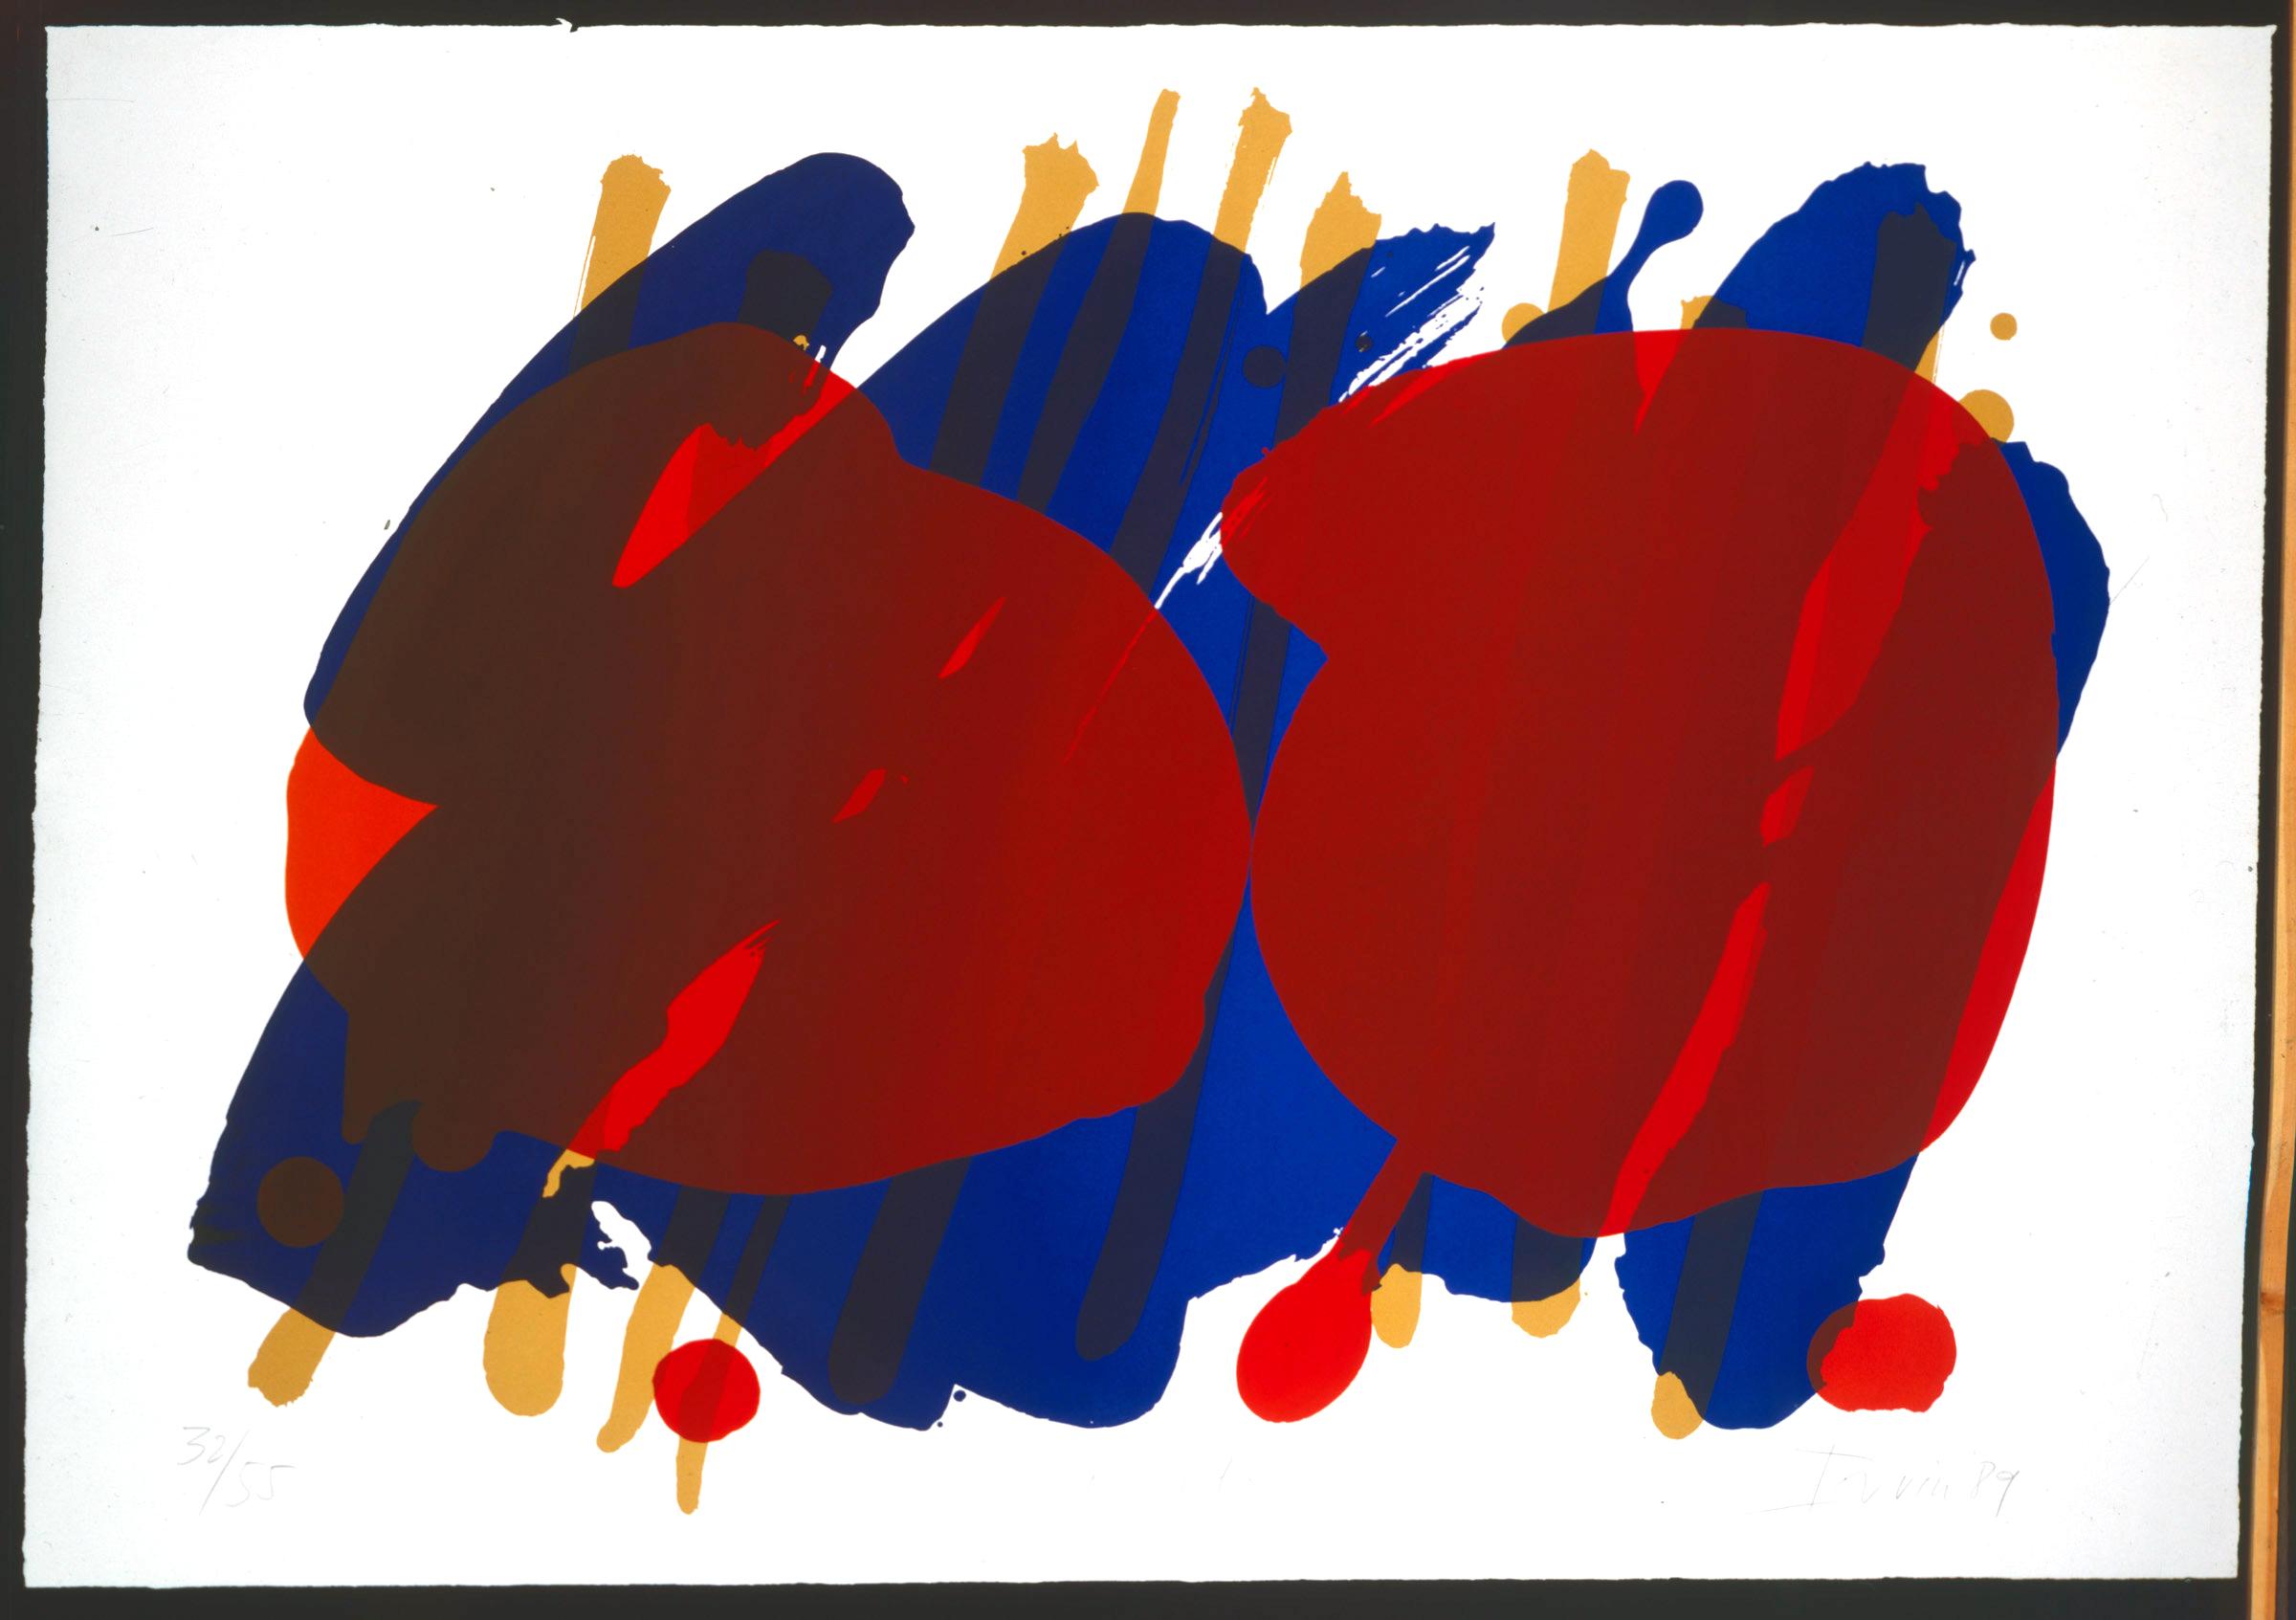 Creekside 1989 Screenprint Edition 55, 50 x 71in, 127 x 180cm.jpg